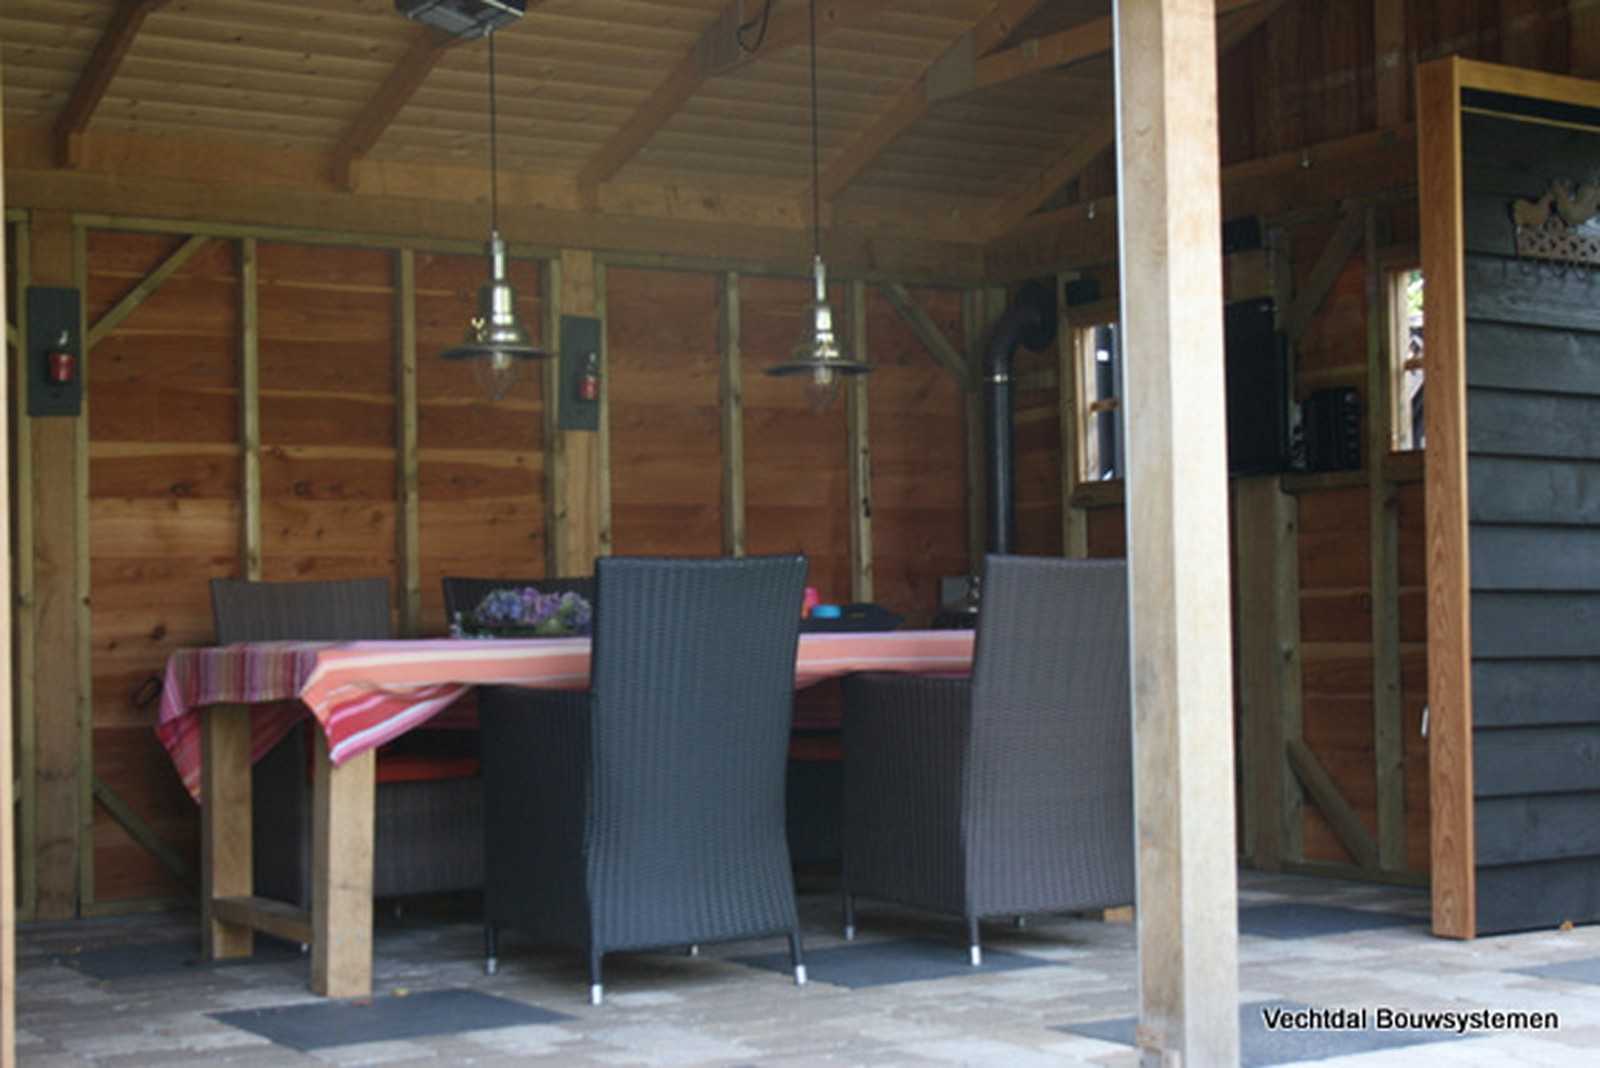 robuuste_buitenkamers - Authentiek eikenhouten tuinhuis met tuinkamer.